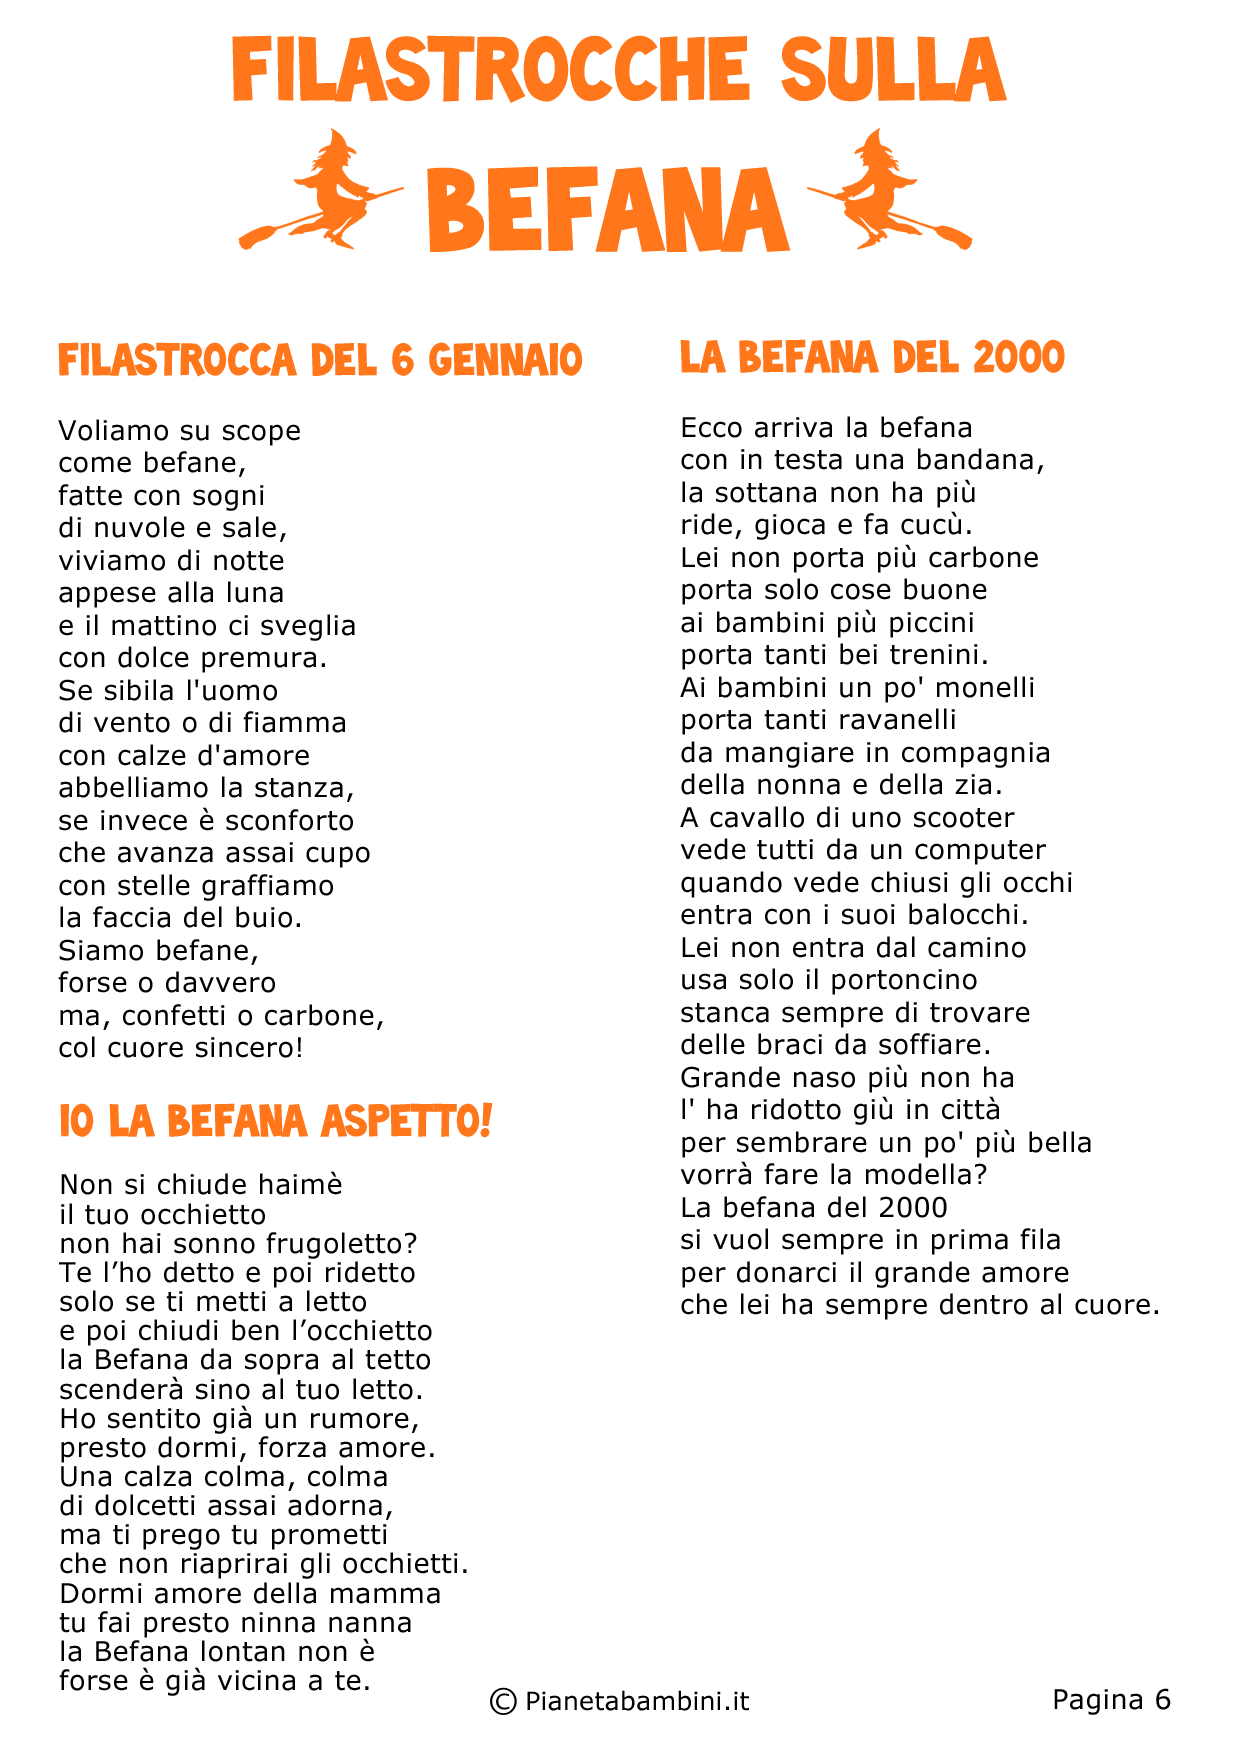 Filastrocche-Befana-6